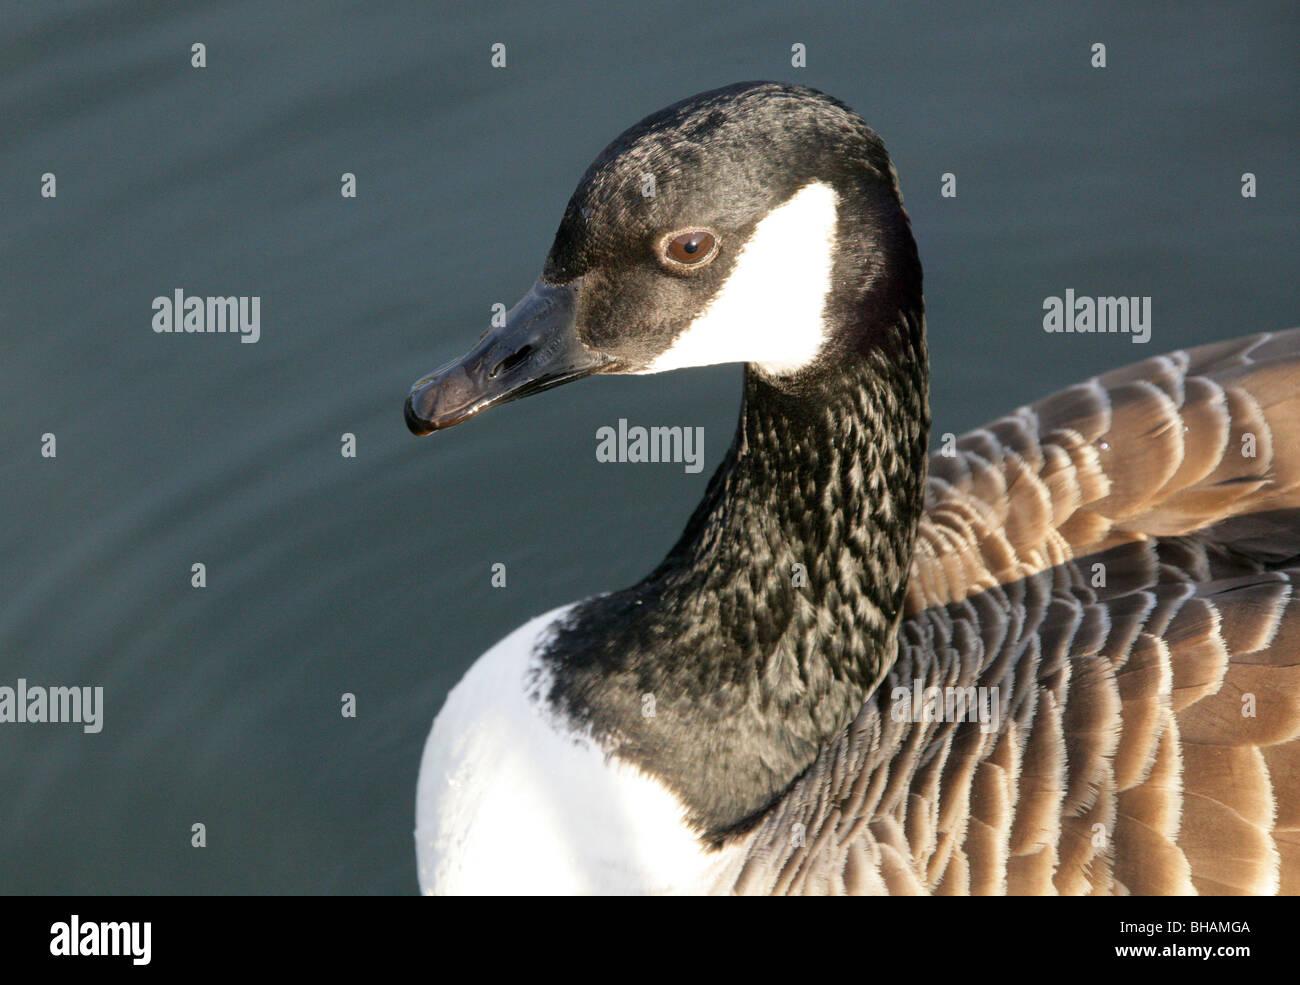 Canada Goose, Branta canadensis, Anatidae - Stock Image